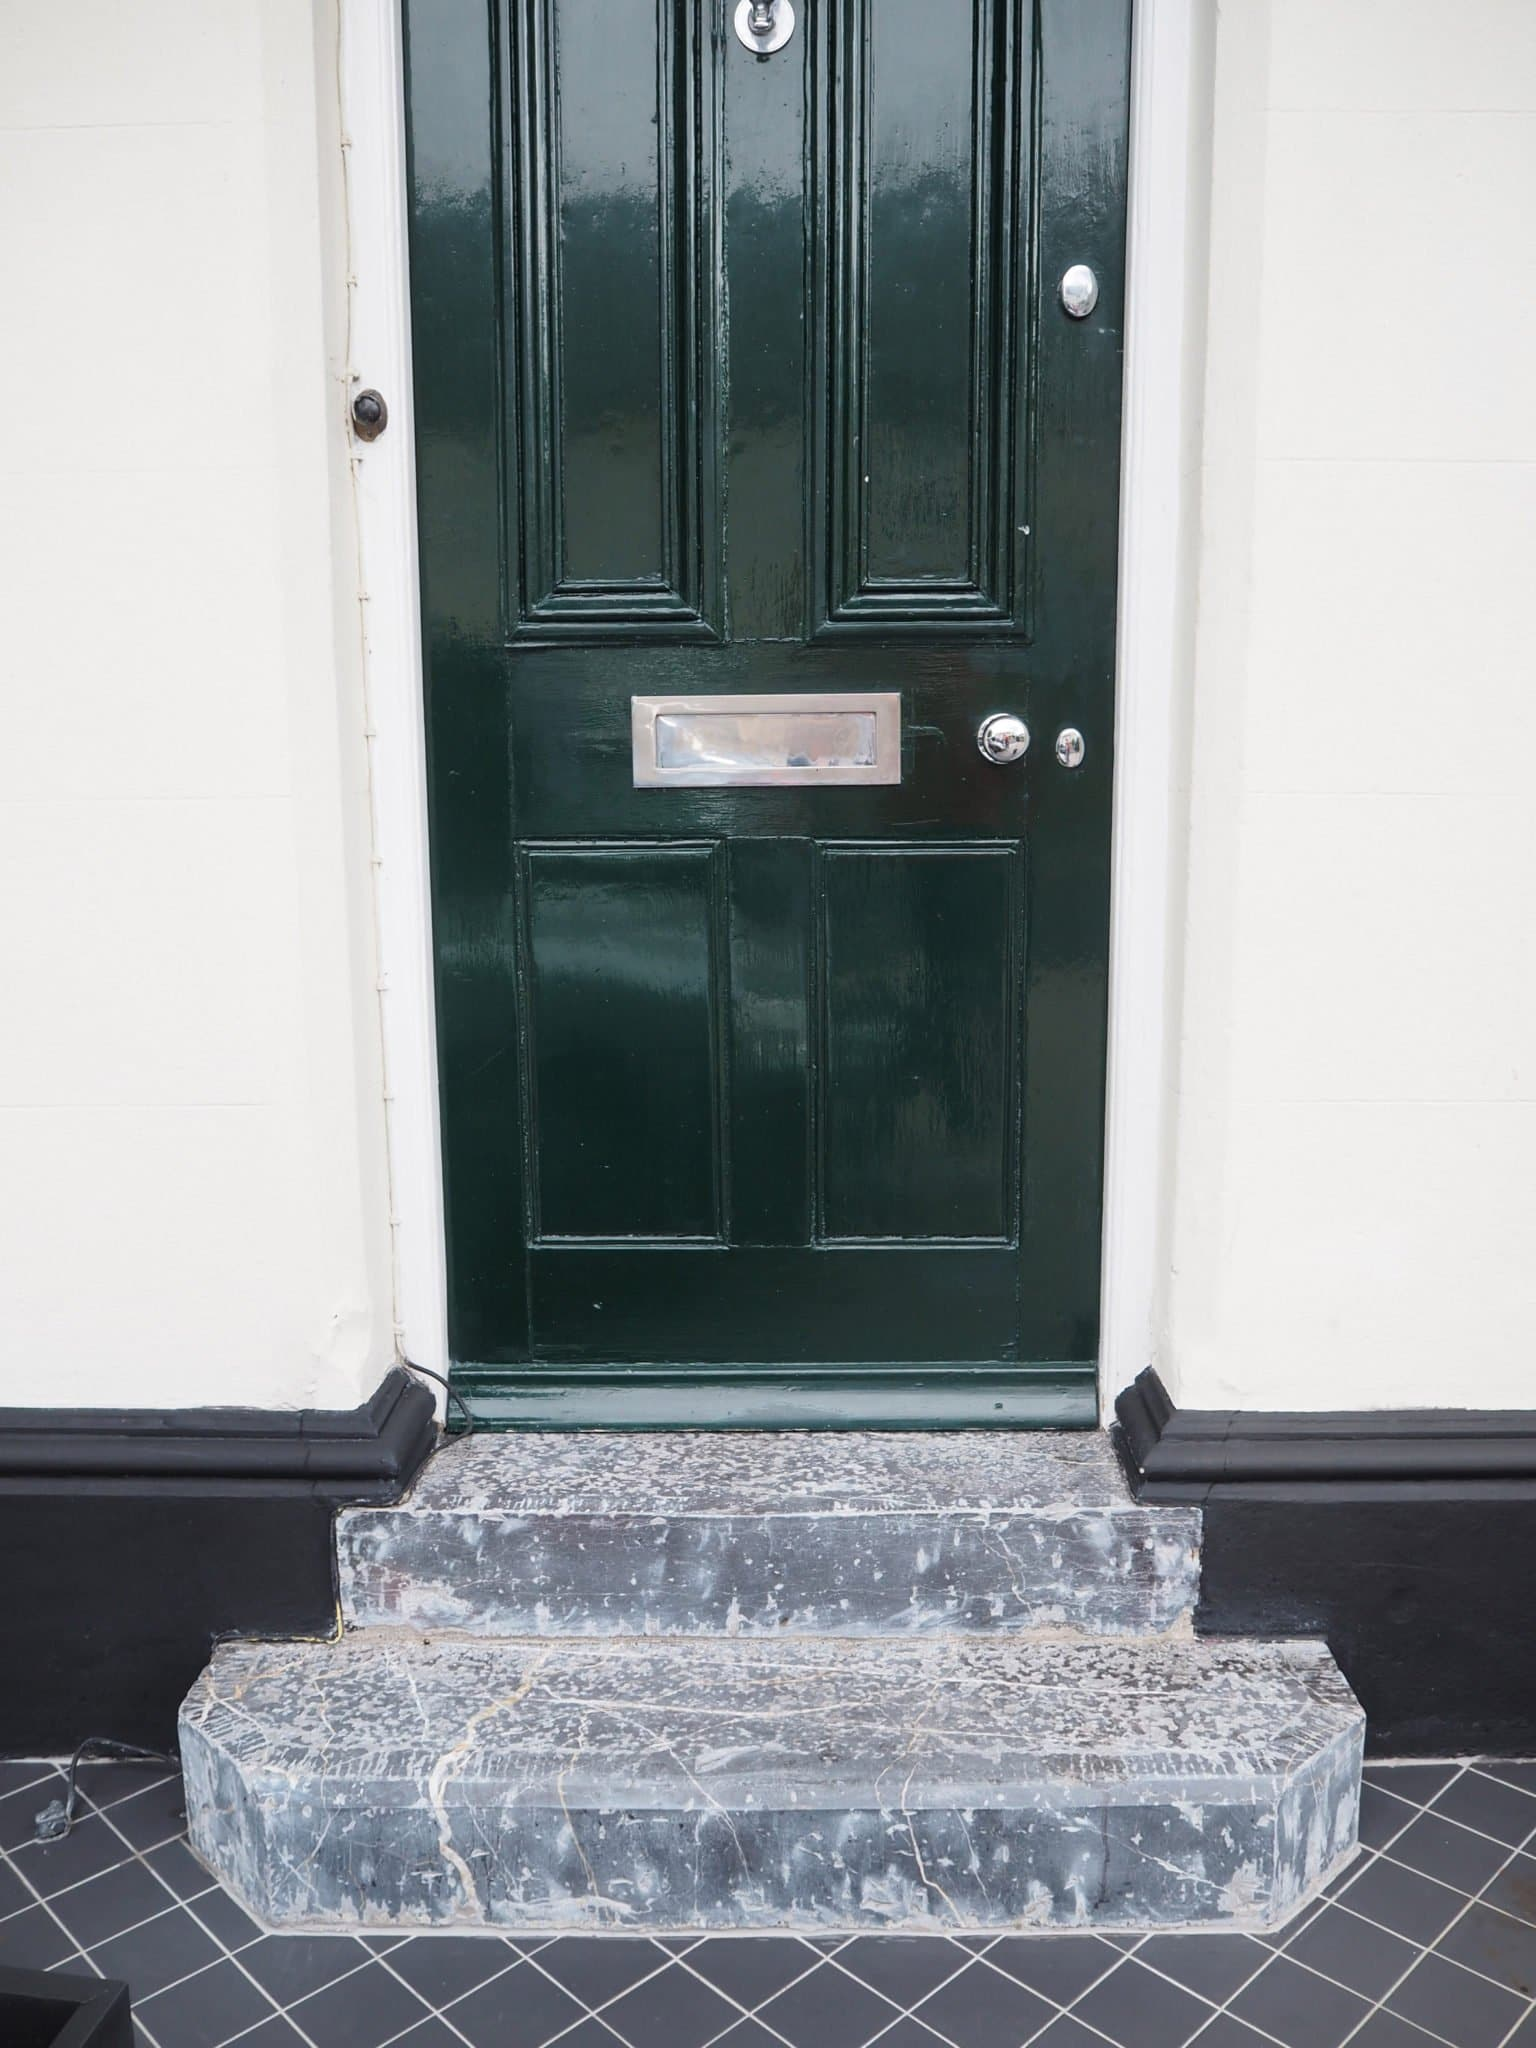 The steps after resurfacing and polishing